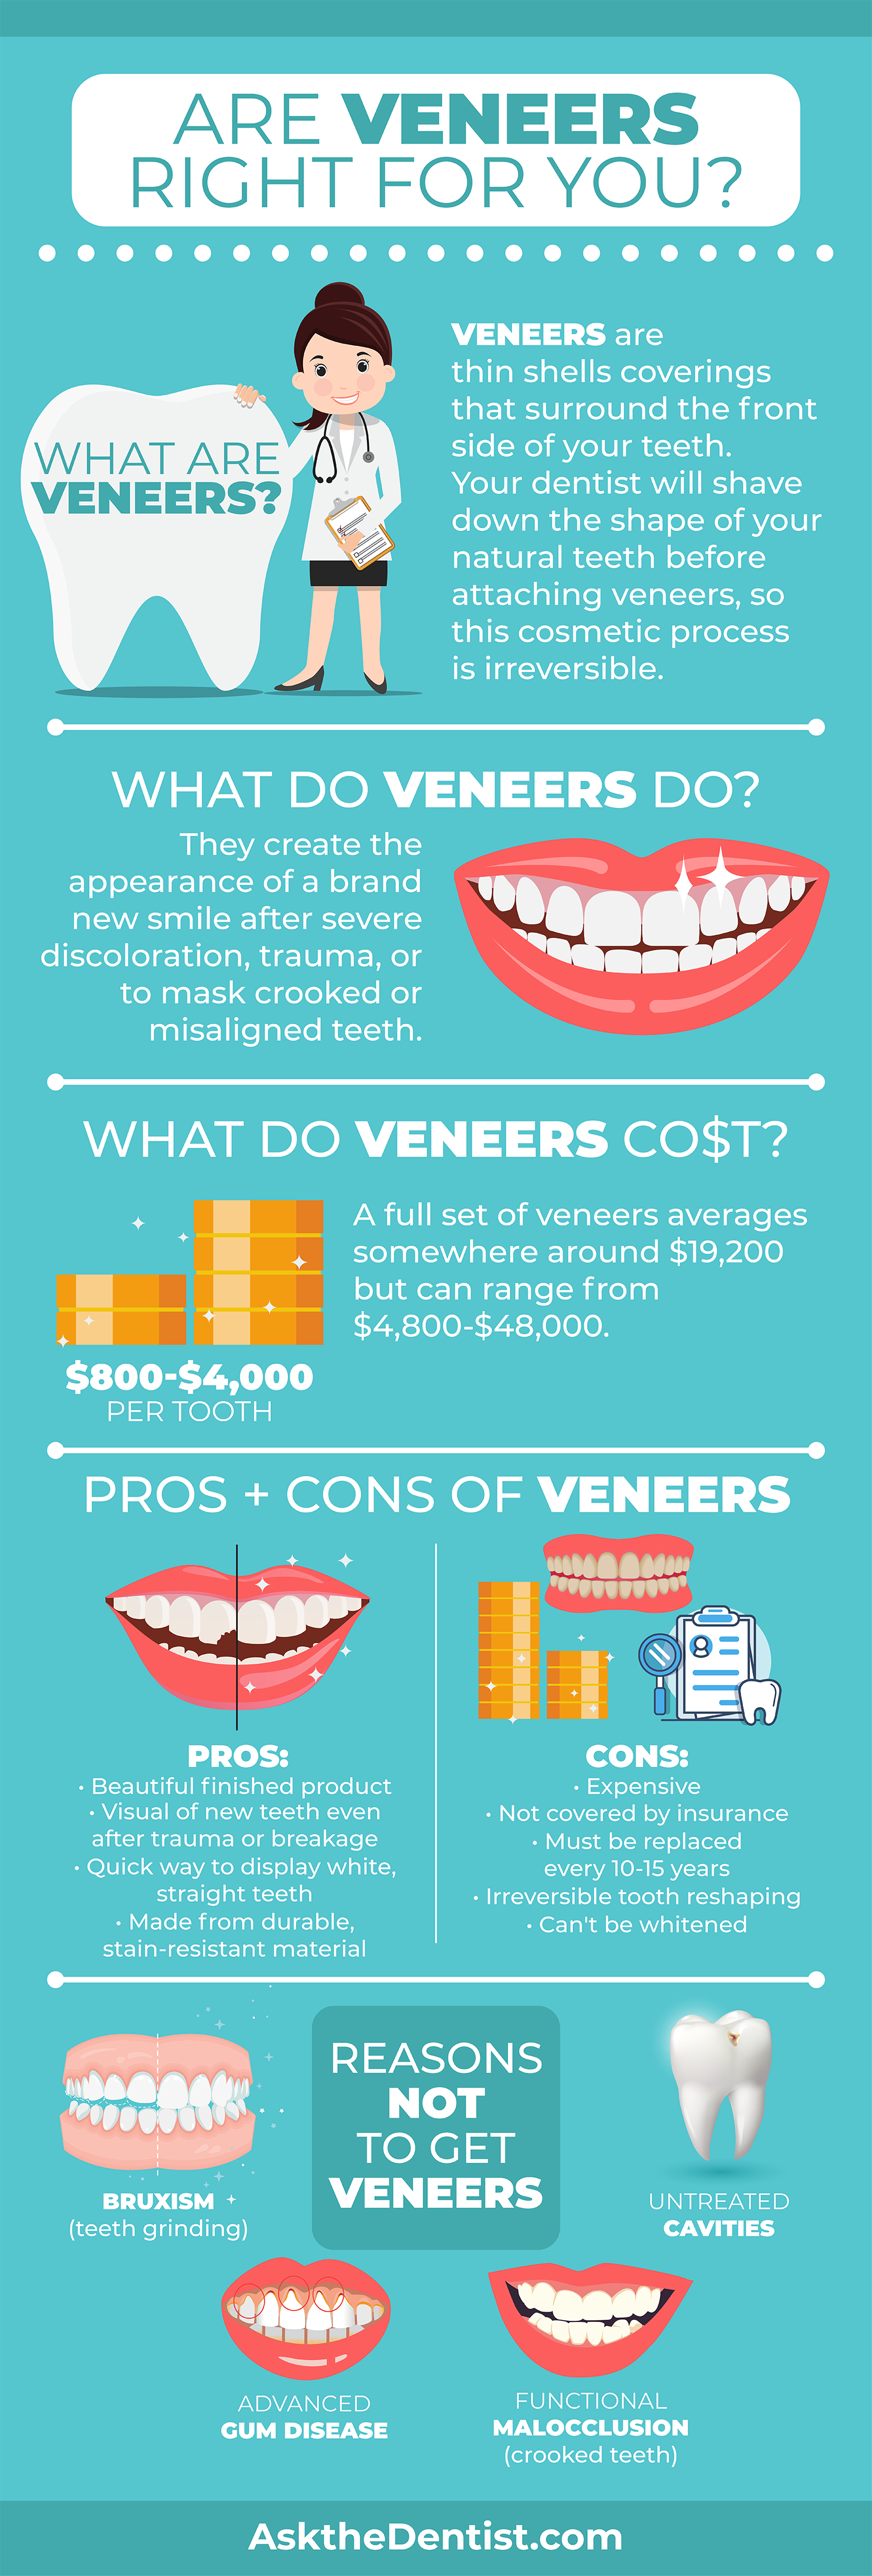 veneers-types-cost-description-pros-cons